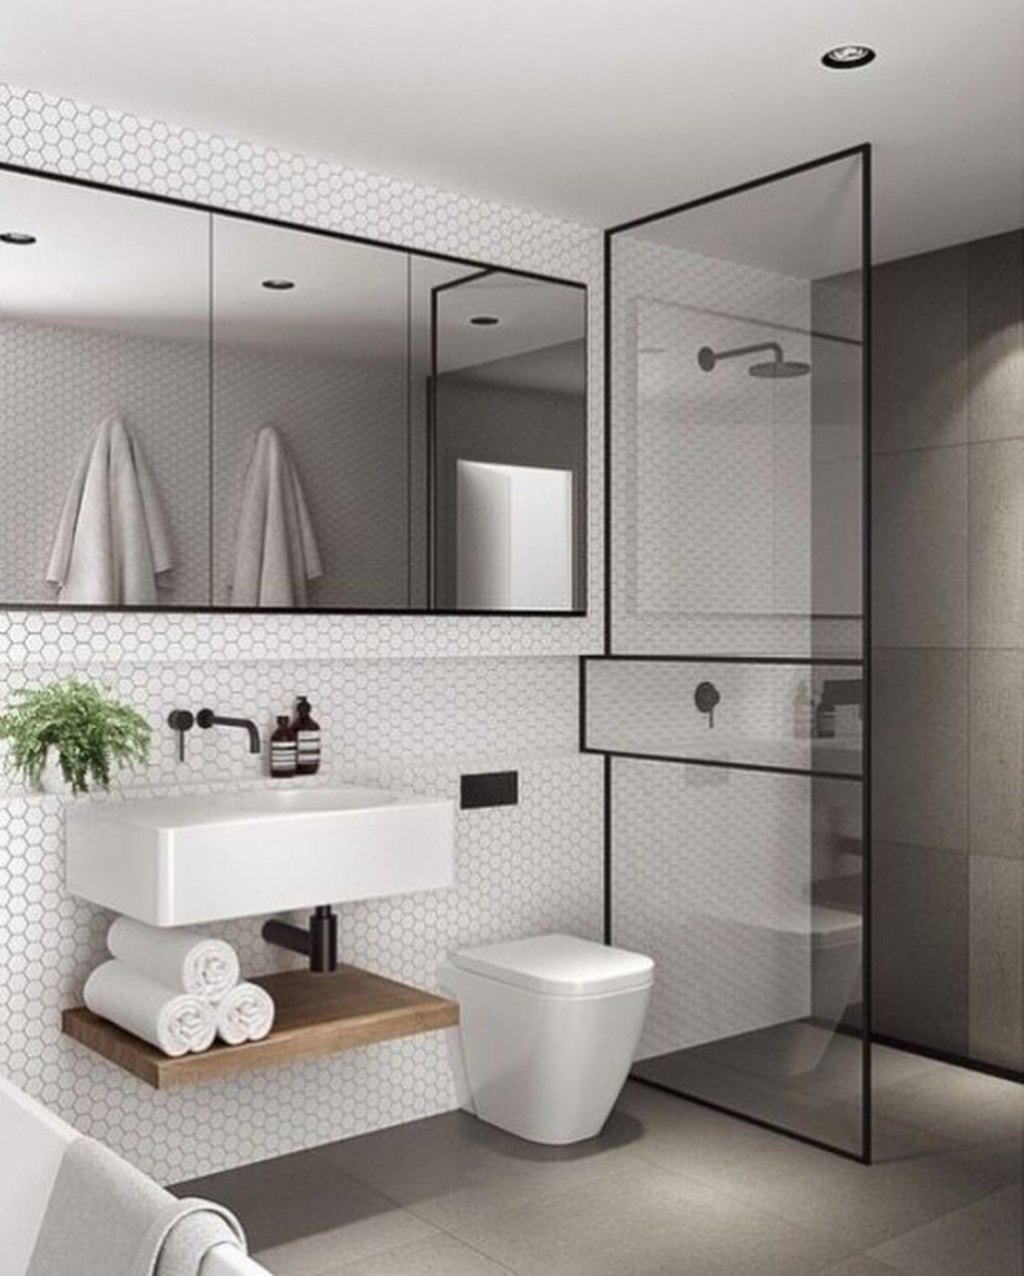 Bathroom Decor With Bling Bathroom Decorative Accessories Bathroom Decor Ideas 2018 Bathroom D In 2020 Bathroom Interior Design Minimalist Bathroom Modern Bathroom